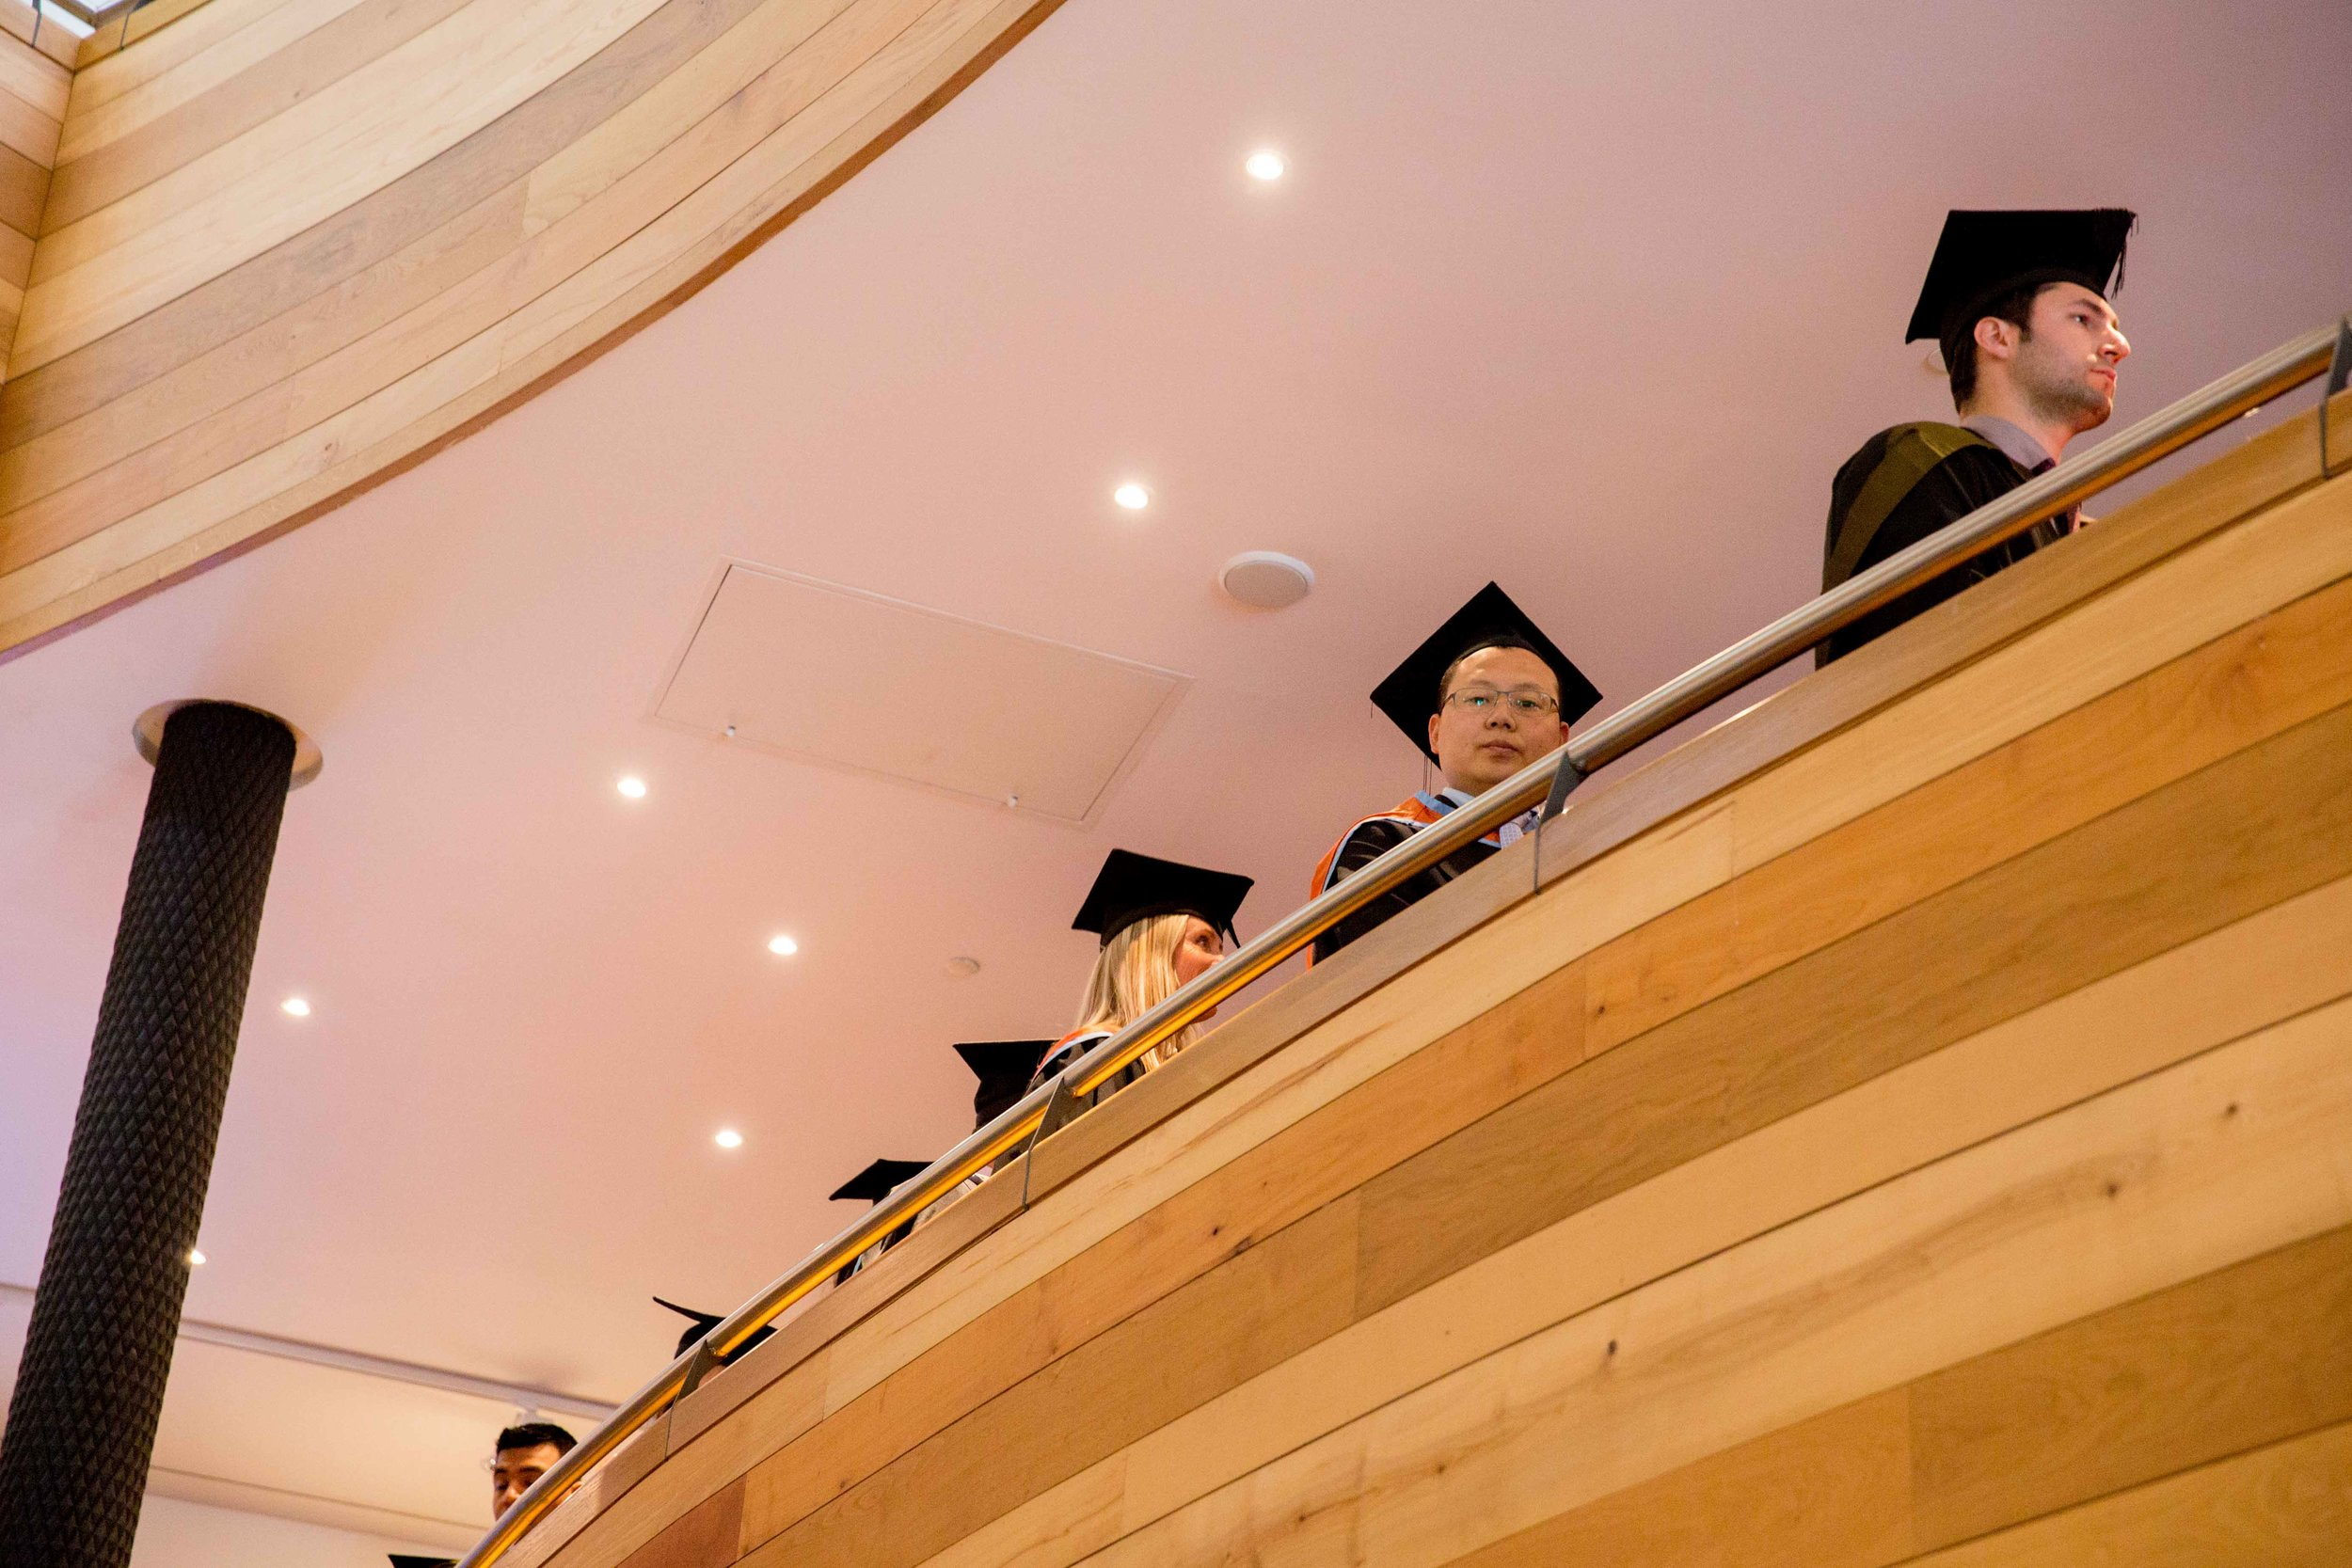 Arden-university-graduation-commercial-photographer-cardiff-natalia-smith-photography-37.jpg